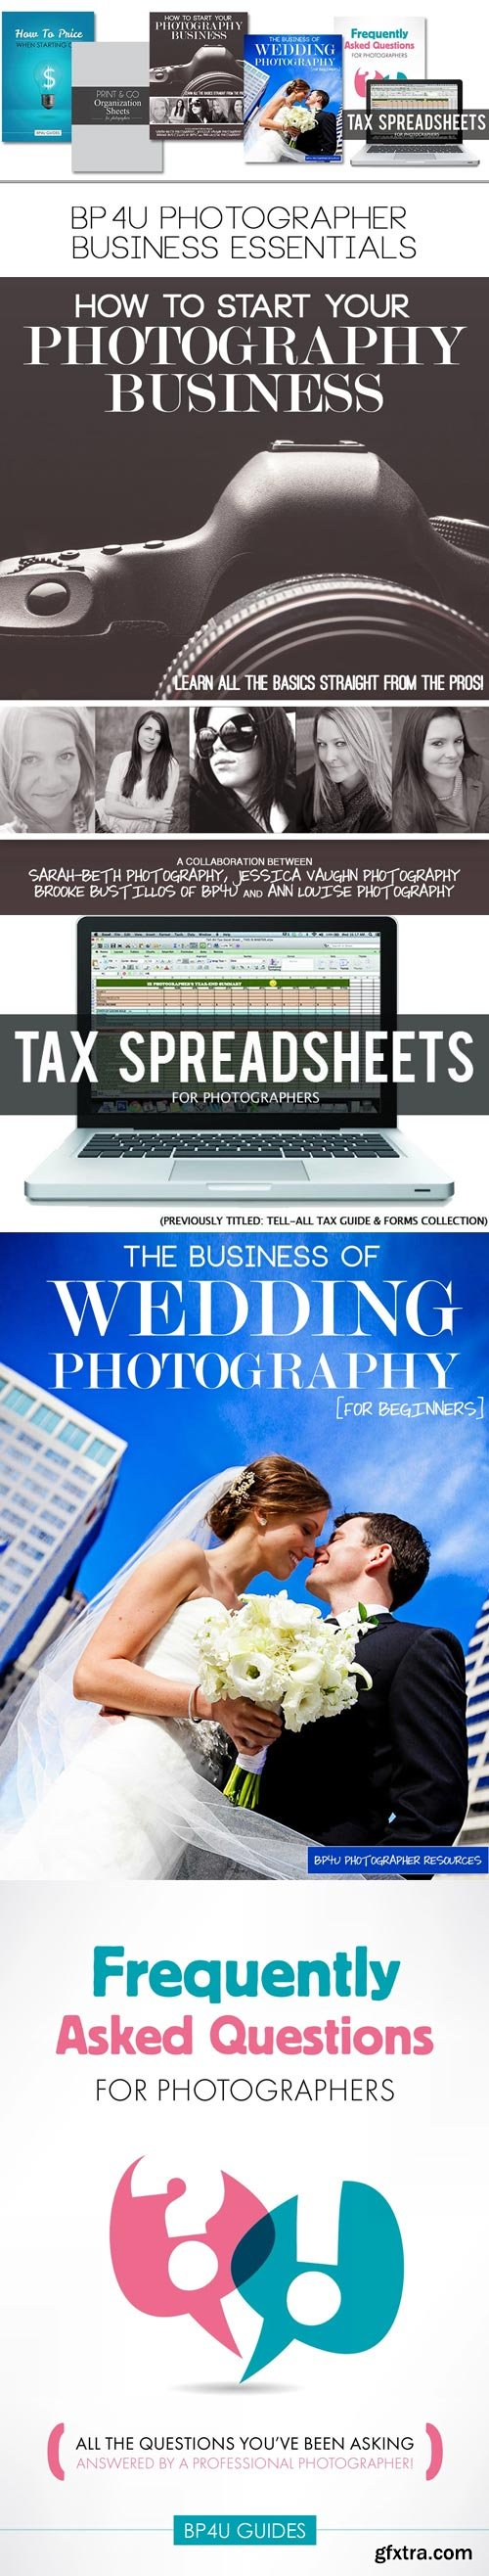 Photographer Resources - BP4U Photographer Business Essentials